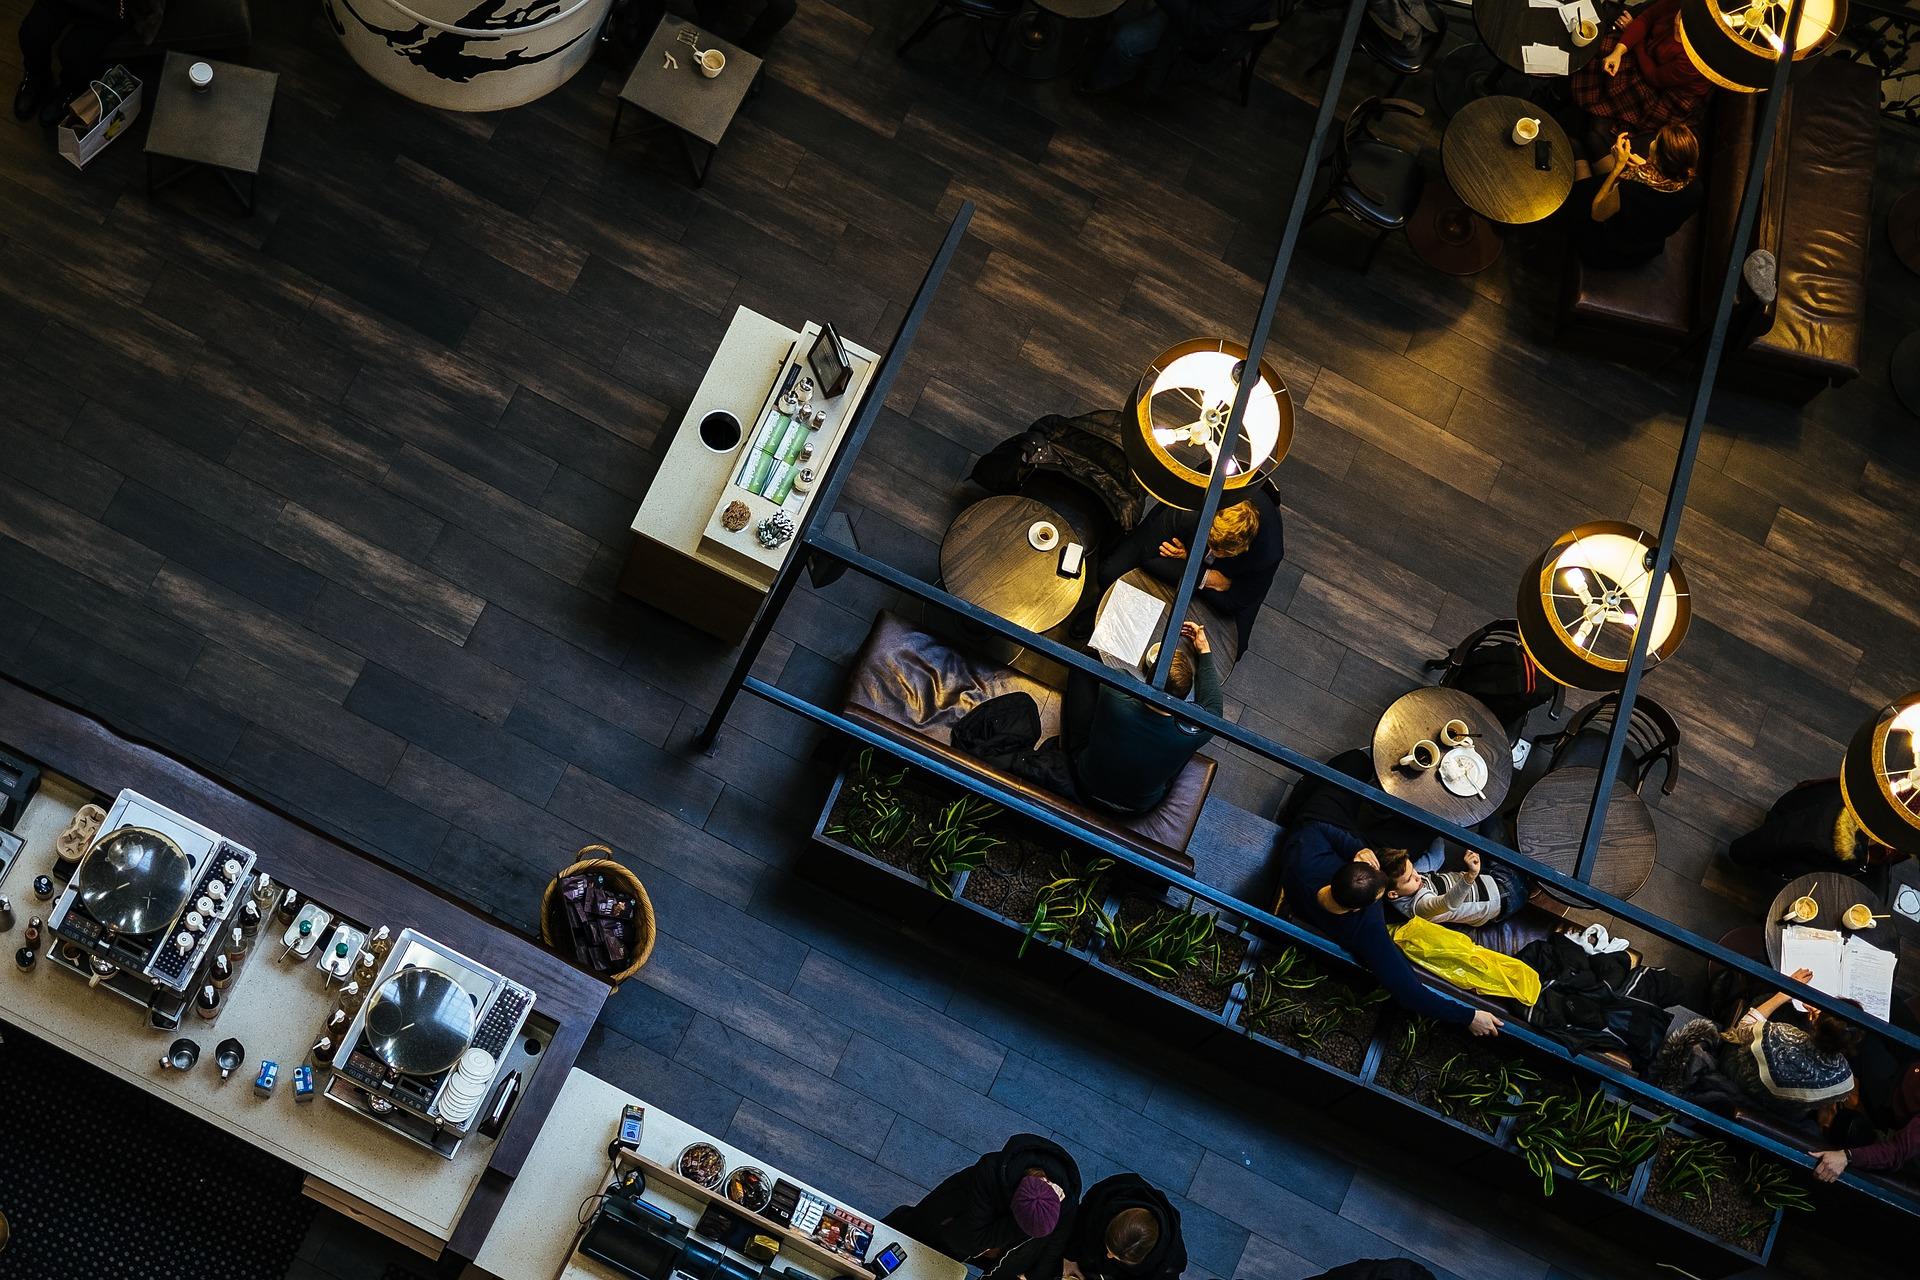 restaurante-desde-arriba